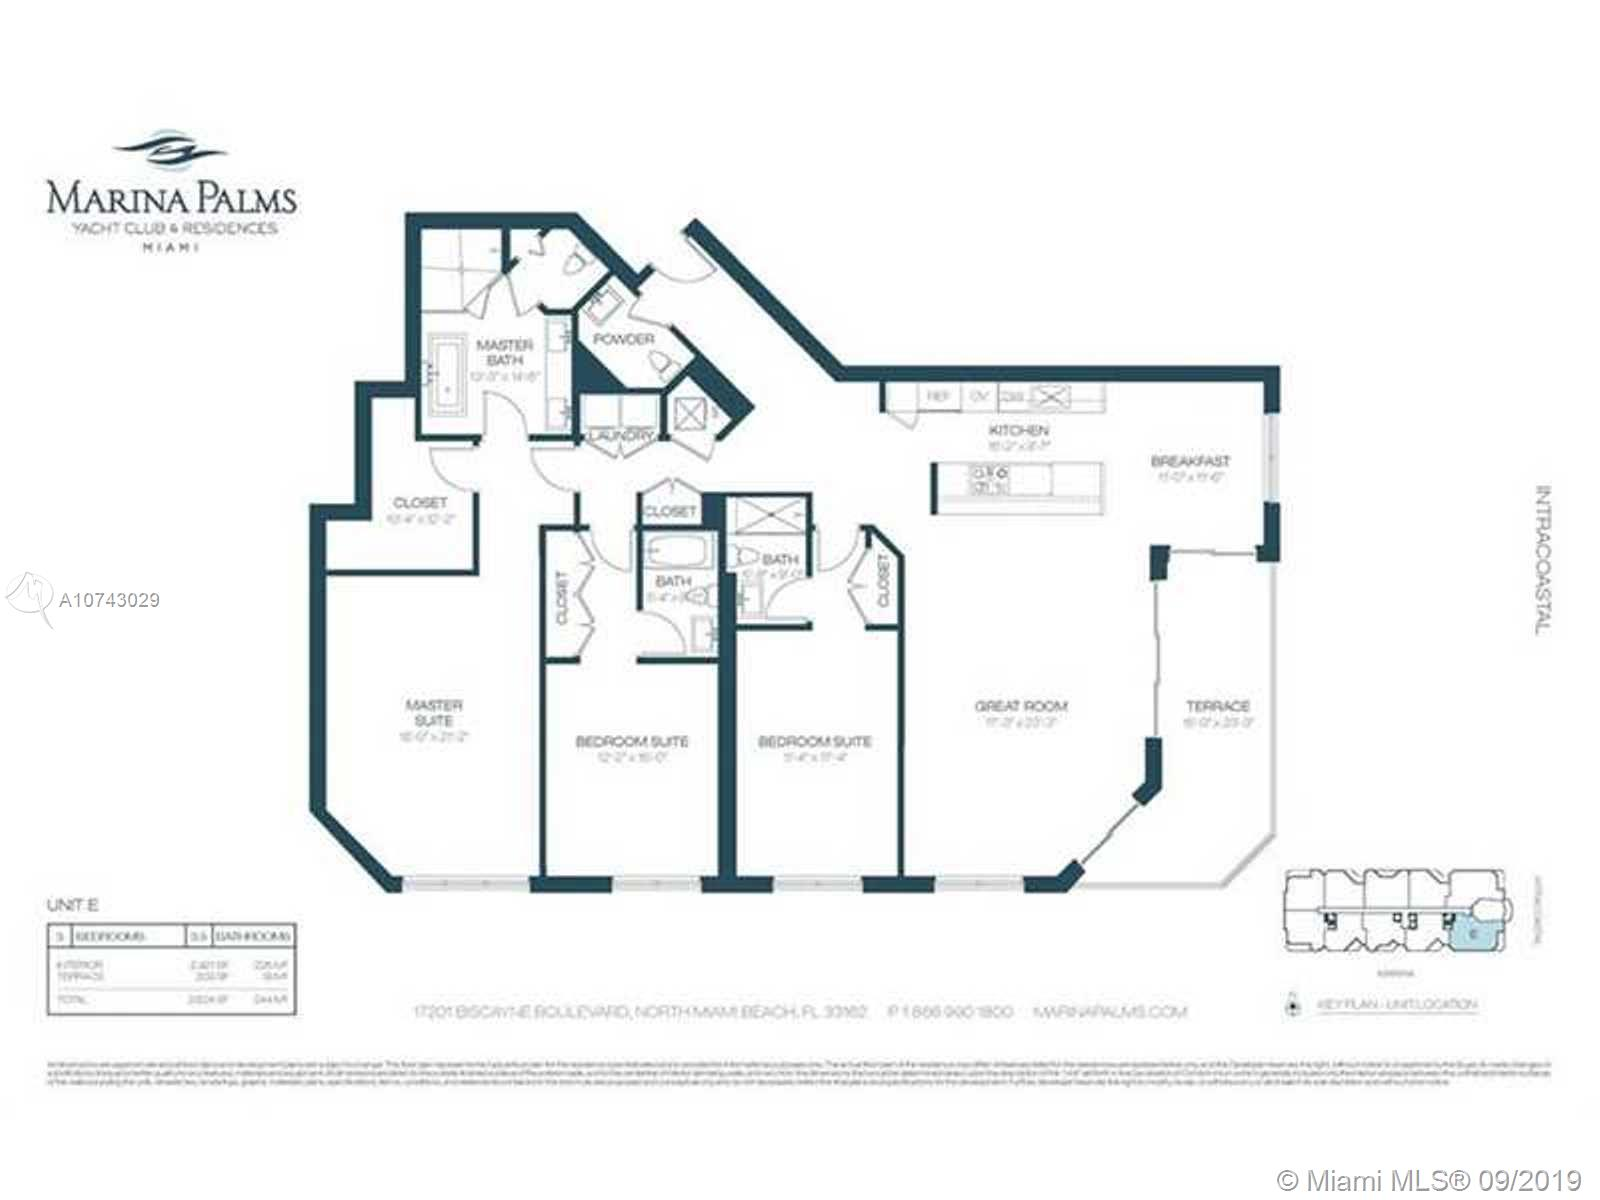 17301 Biscayne Blvd # 1109, Aventura, Florida 33160, 3 Bedrooms Bedrooms, ,4 BathroomsBathrooms,Residential,For Sale,17301 Biscayne Blvd # 1109,A10743029